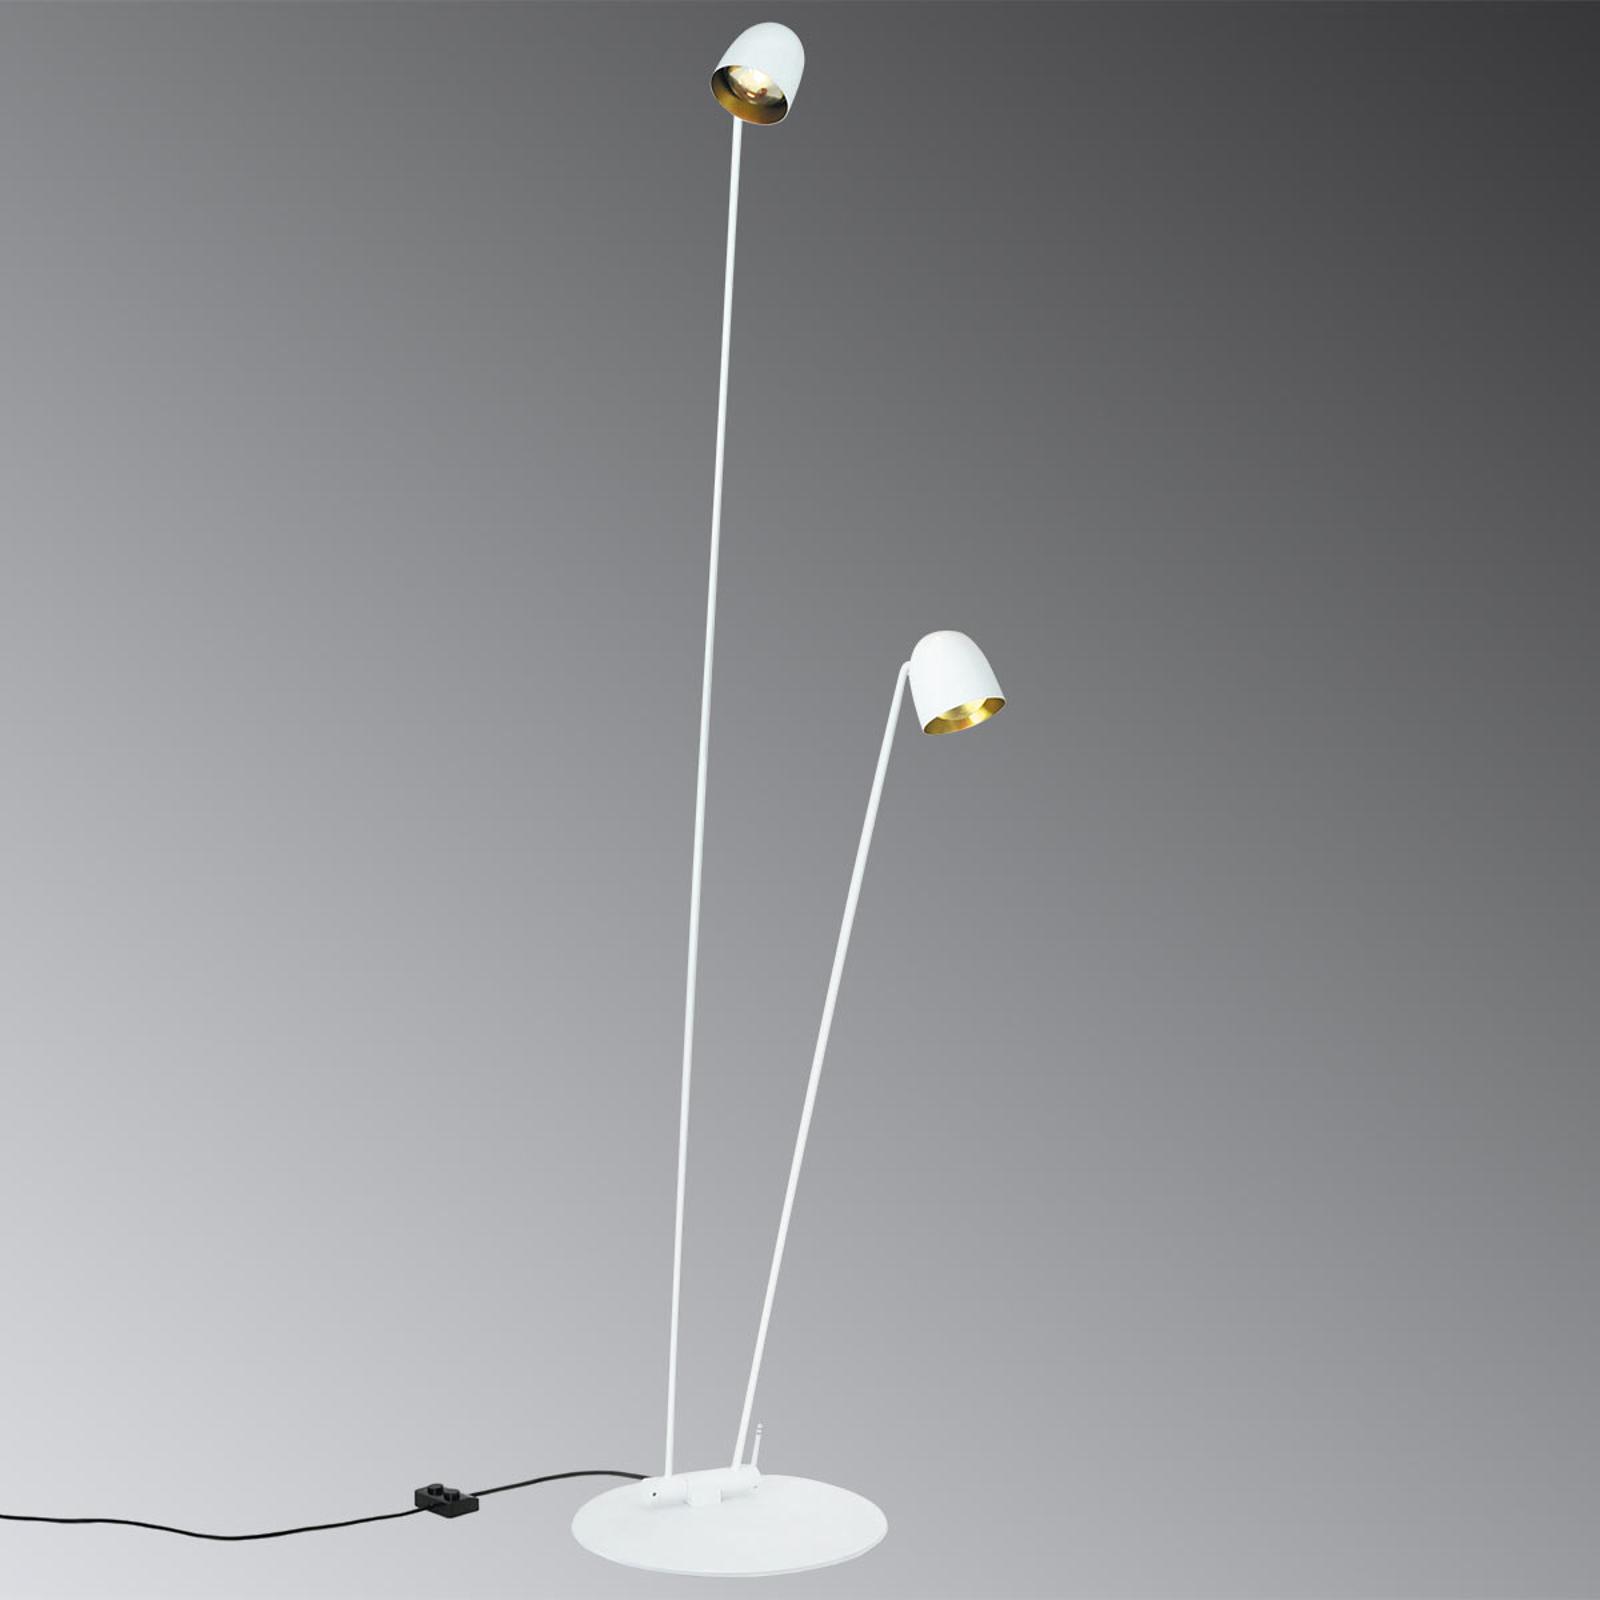 Hvit LED-gulvlampe Speers F fleksibel justerbar